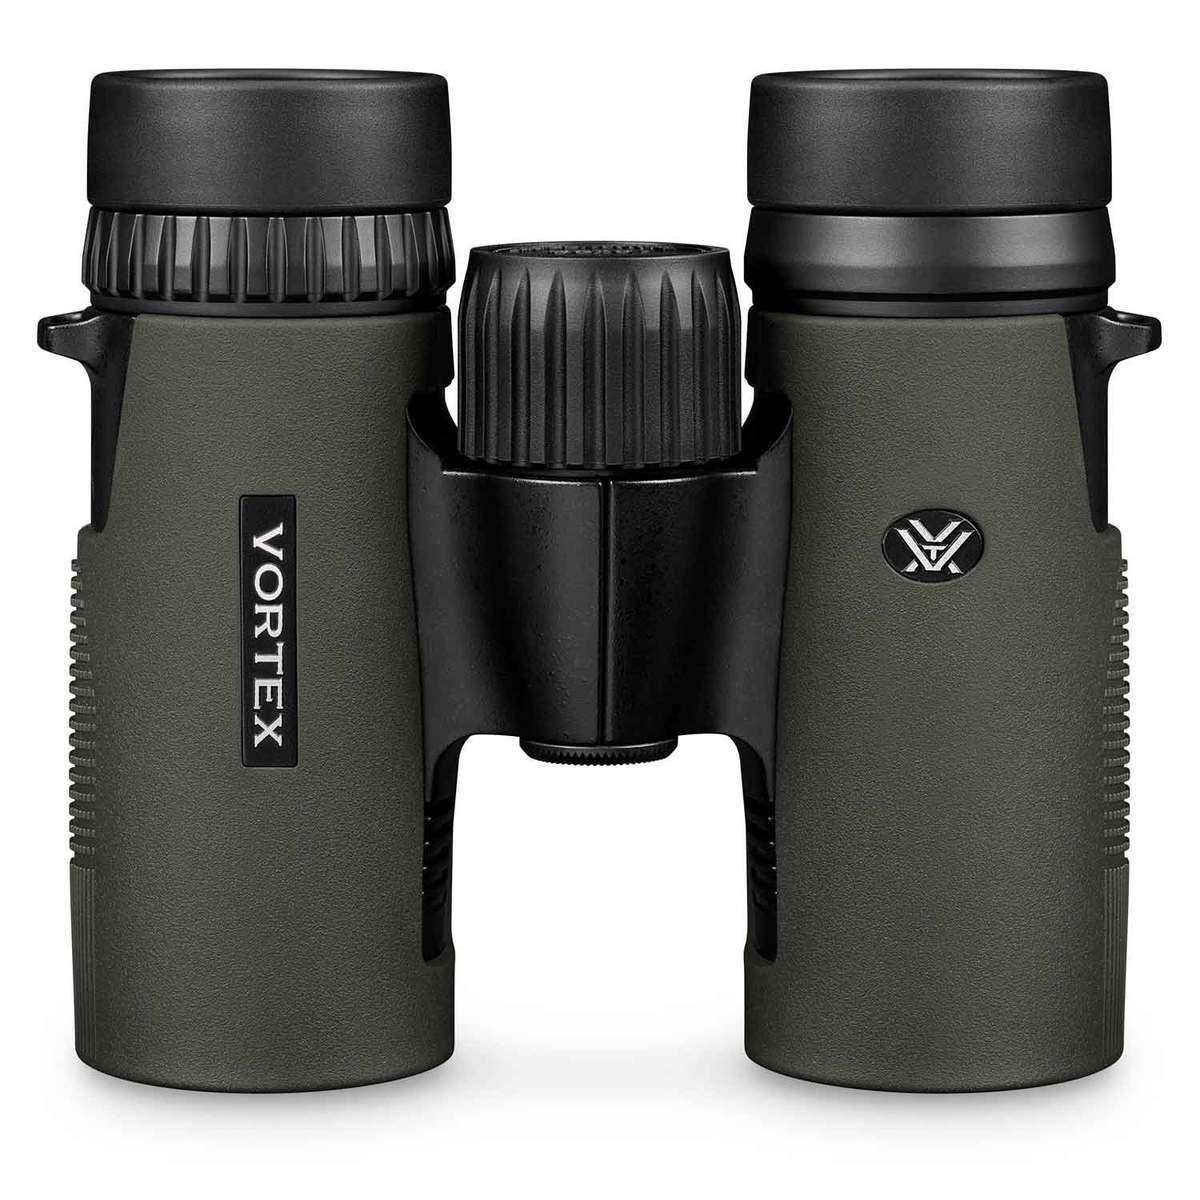 Vortex Diamondback Compact Binoculars - 10x32